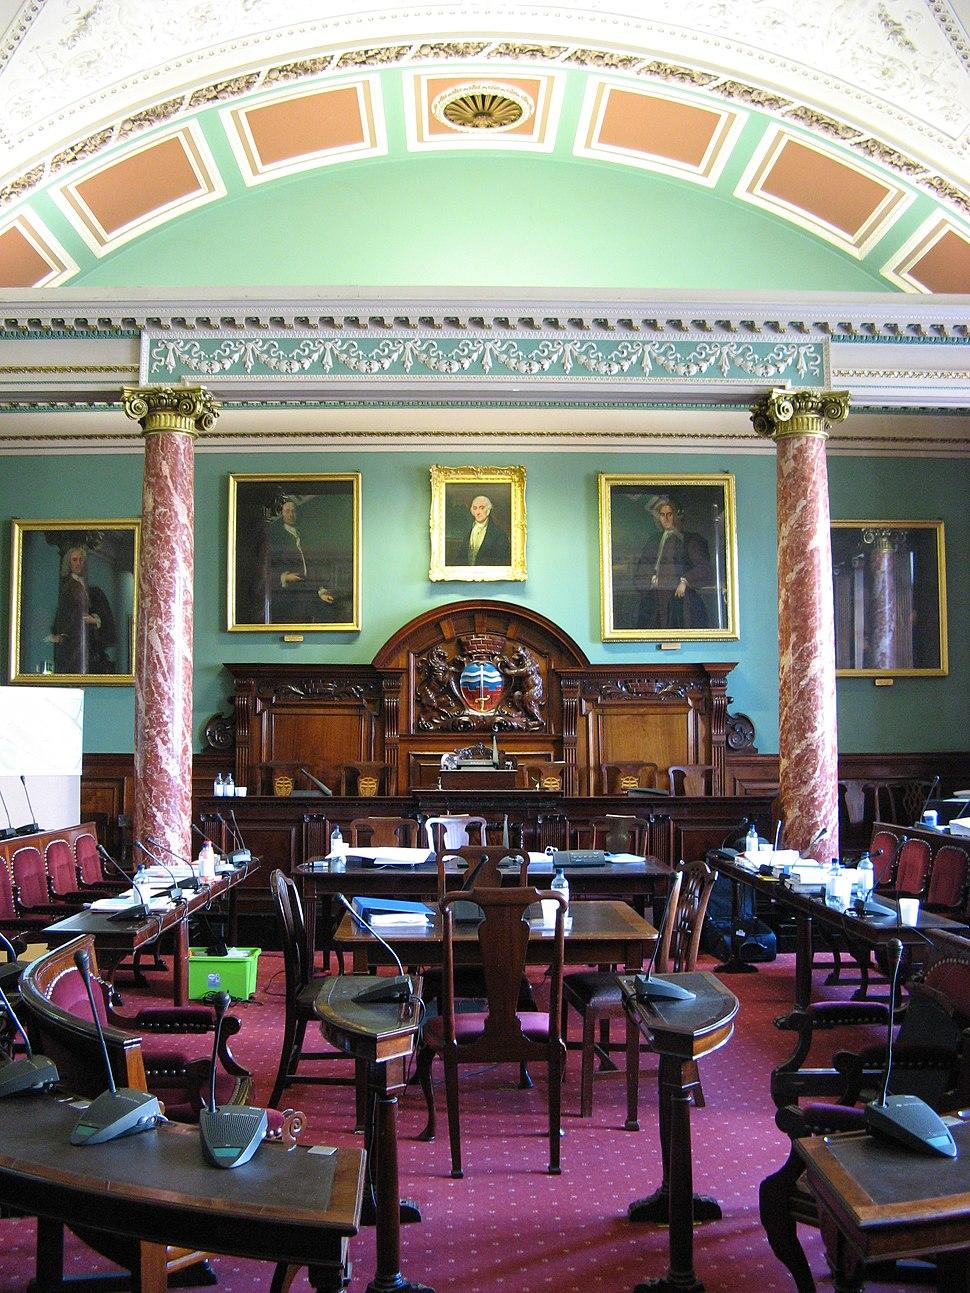 Bath Guildhall, Council chamber, toward chair